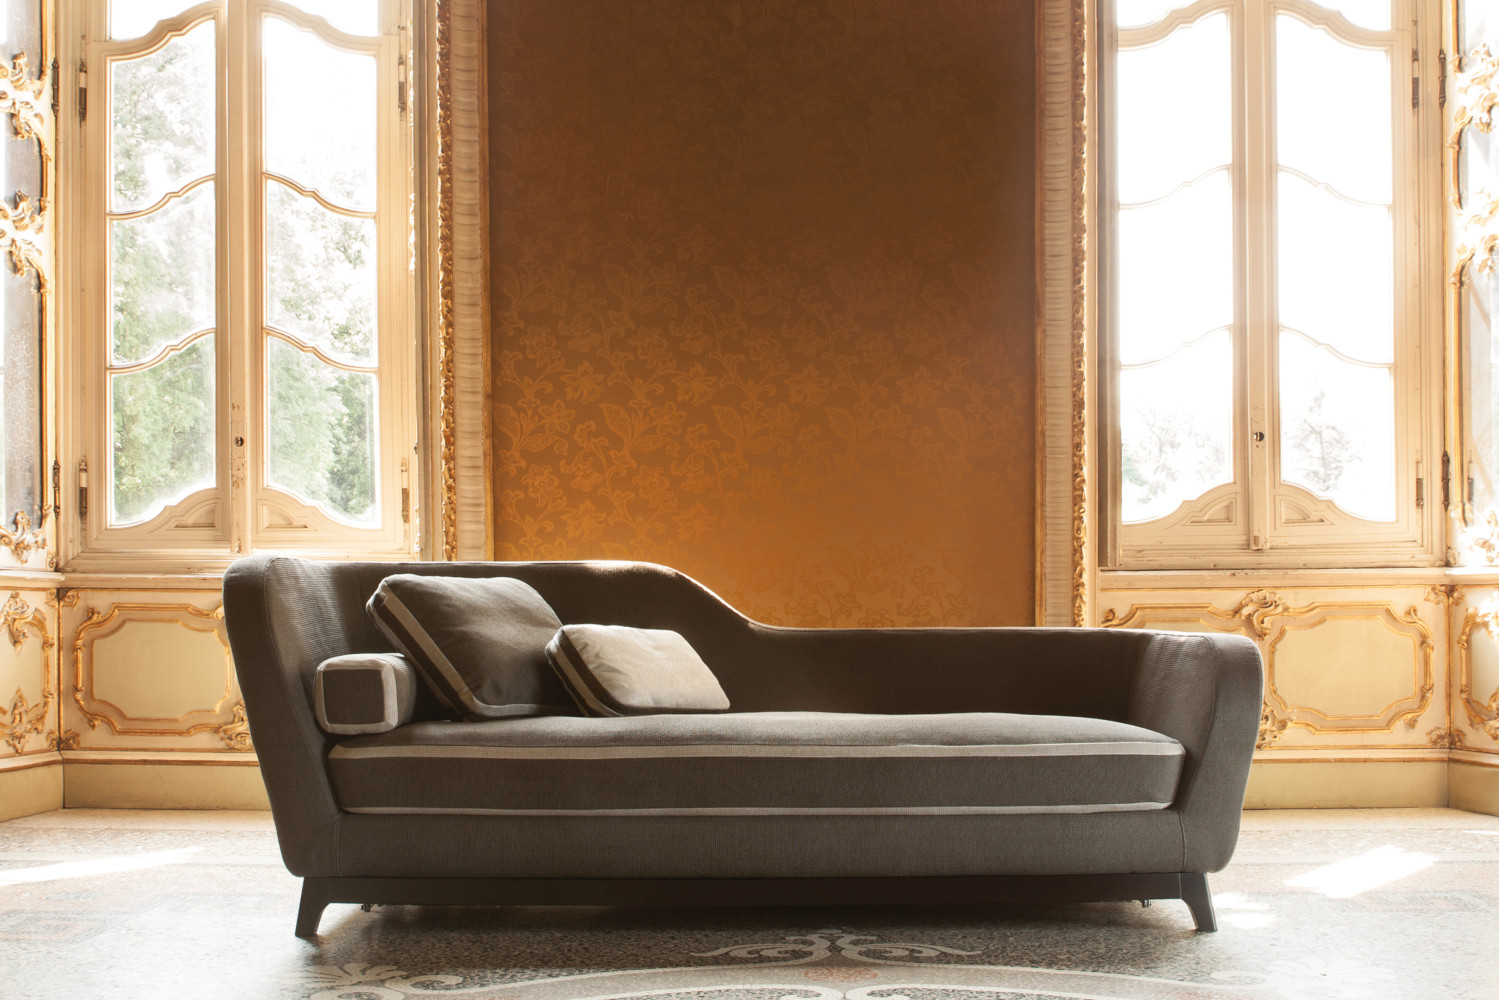 Pouf Dormeuse Morfo : Dormeuse divano letto design jeremie